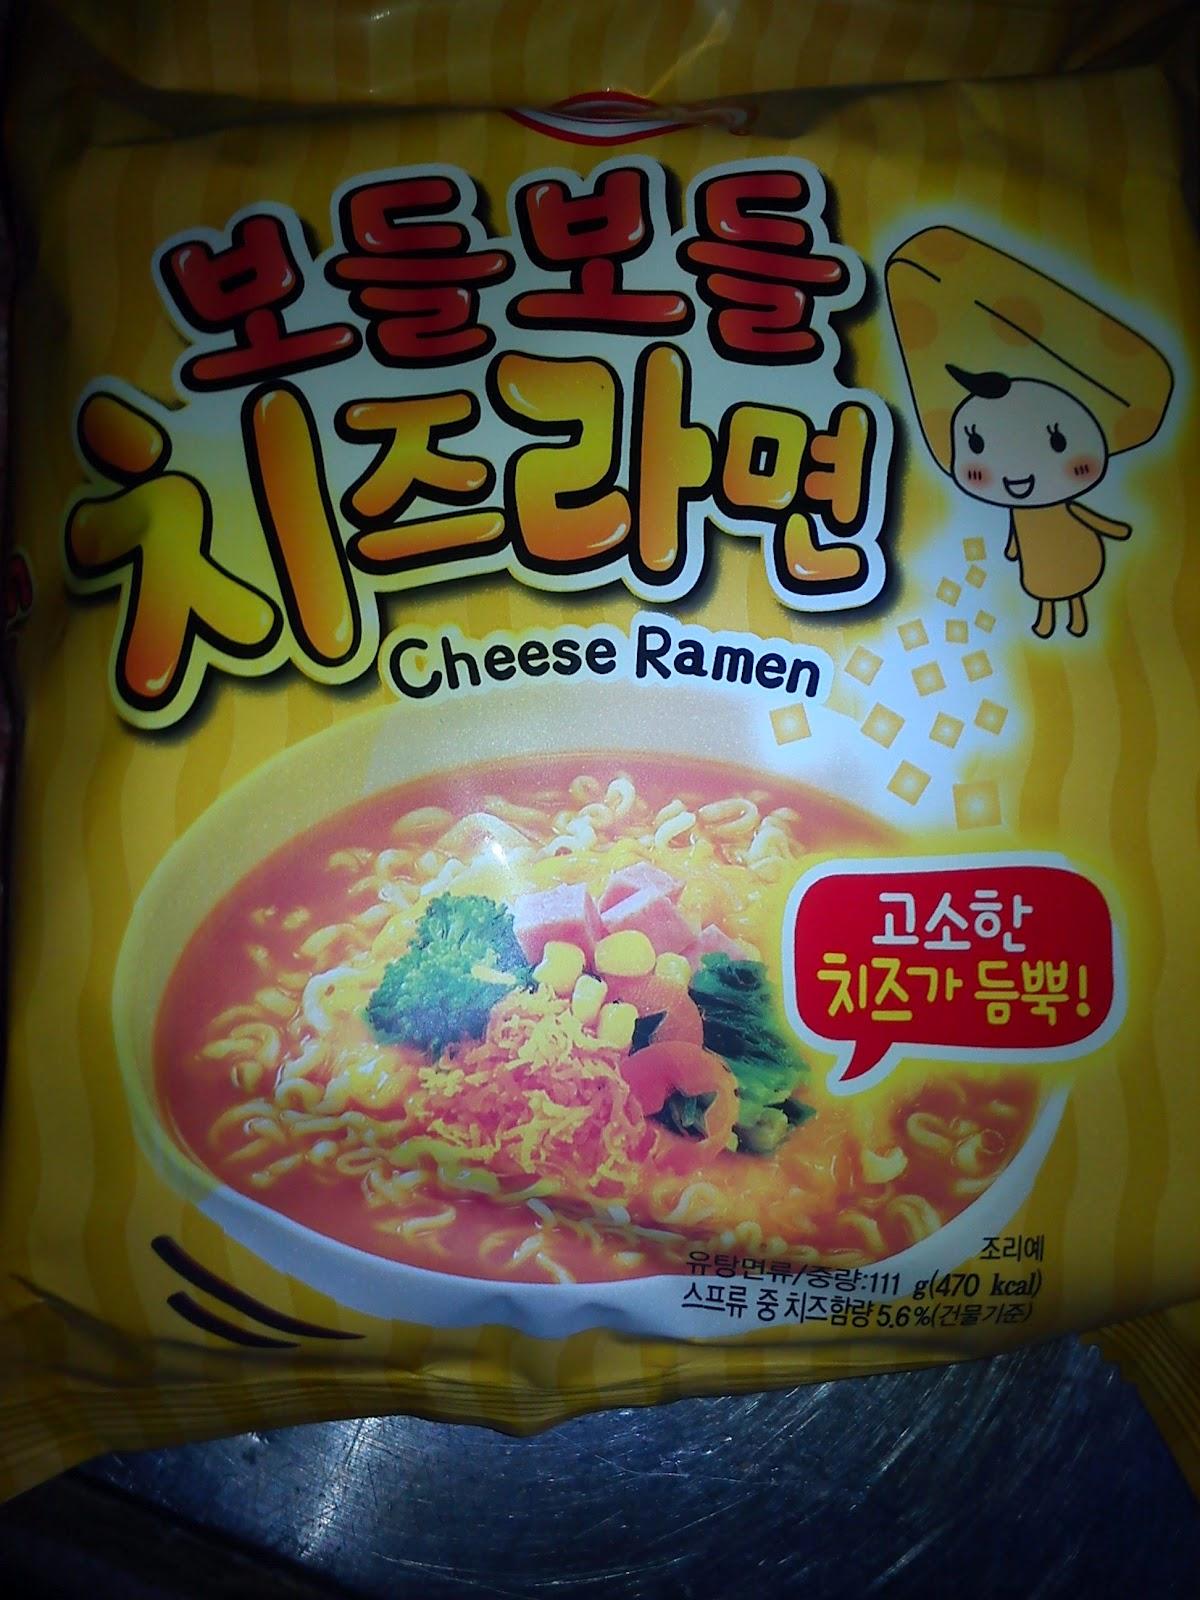 LCK: 韓國食品之芝士公仔麵